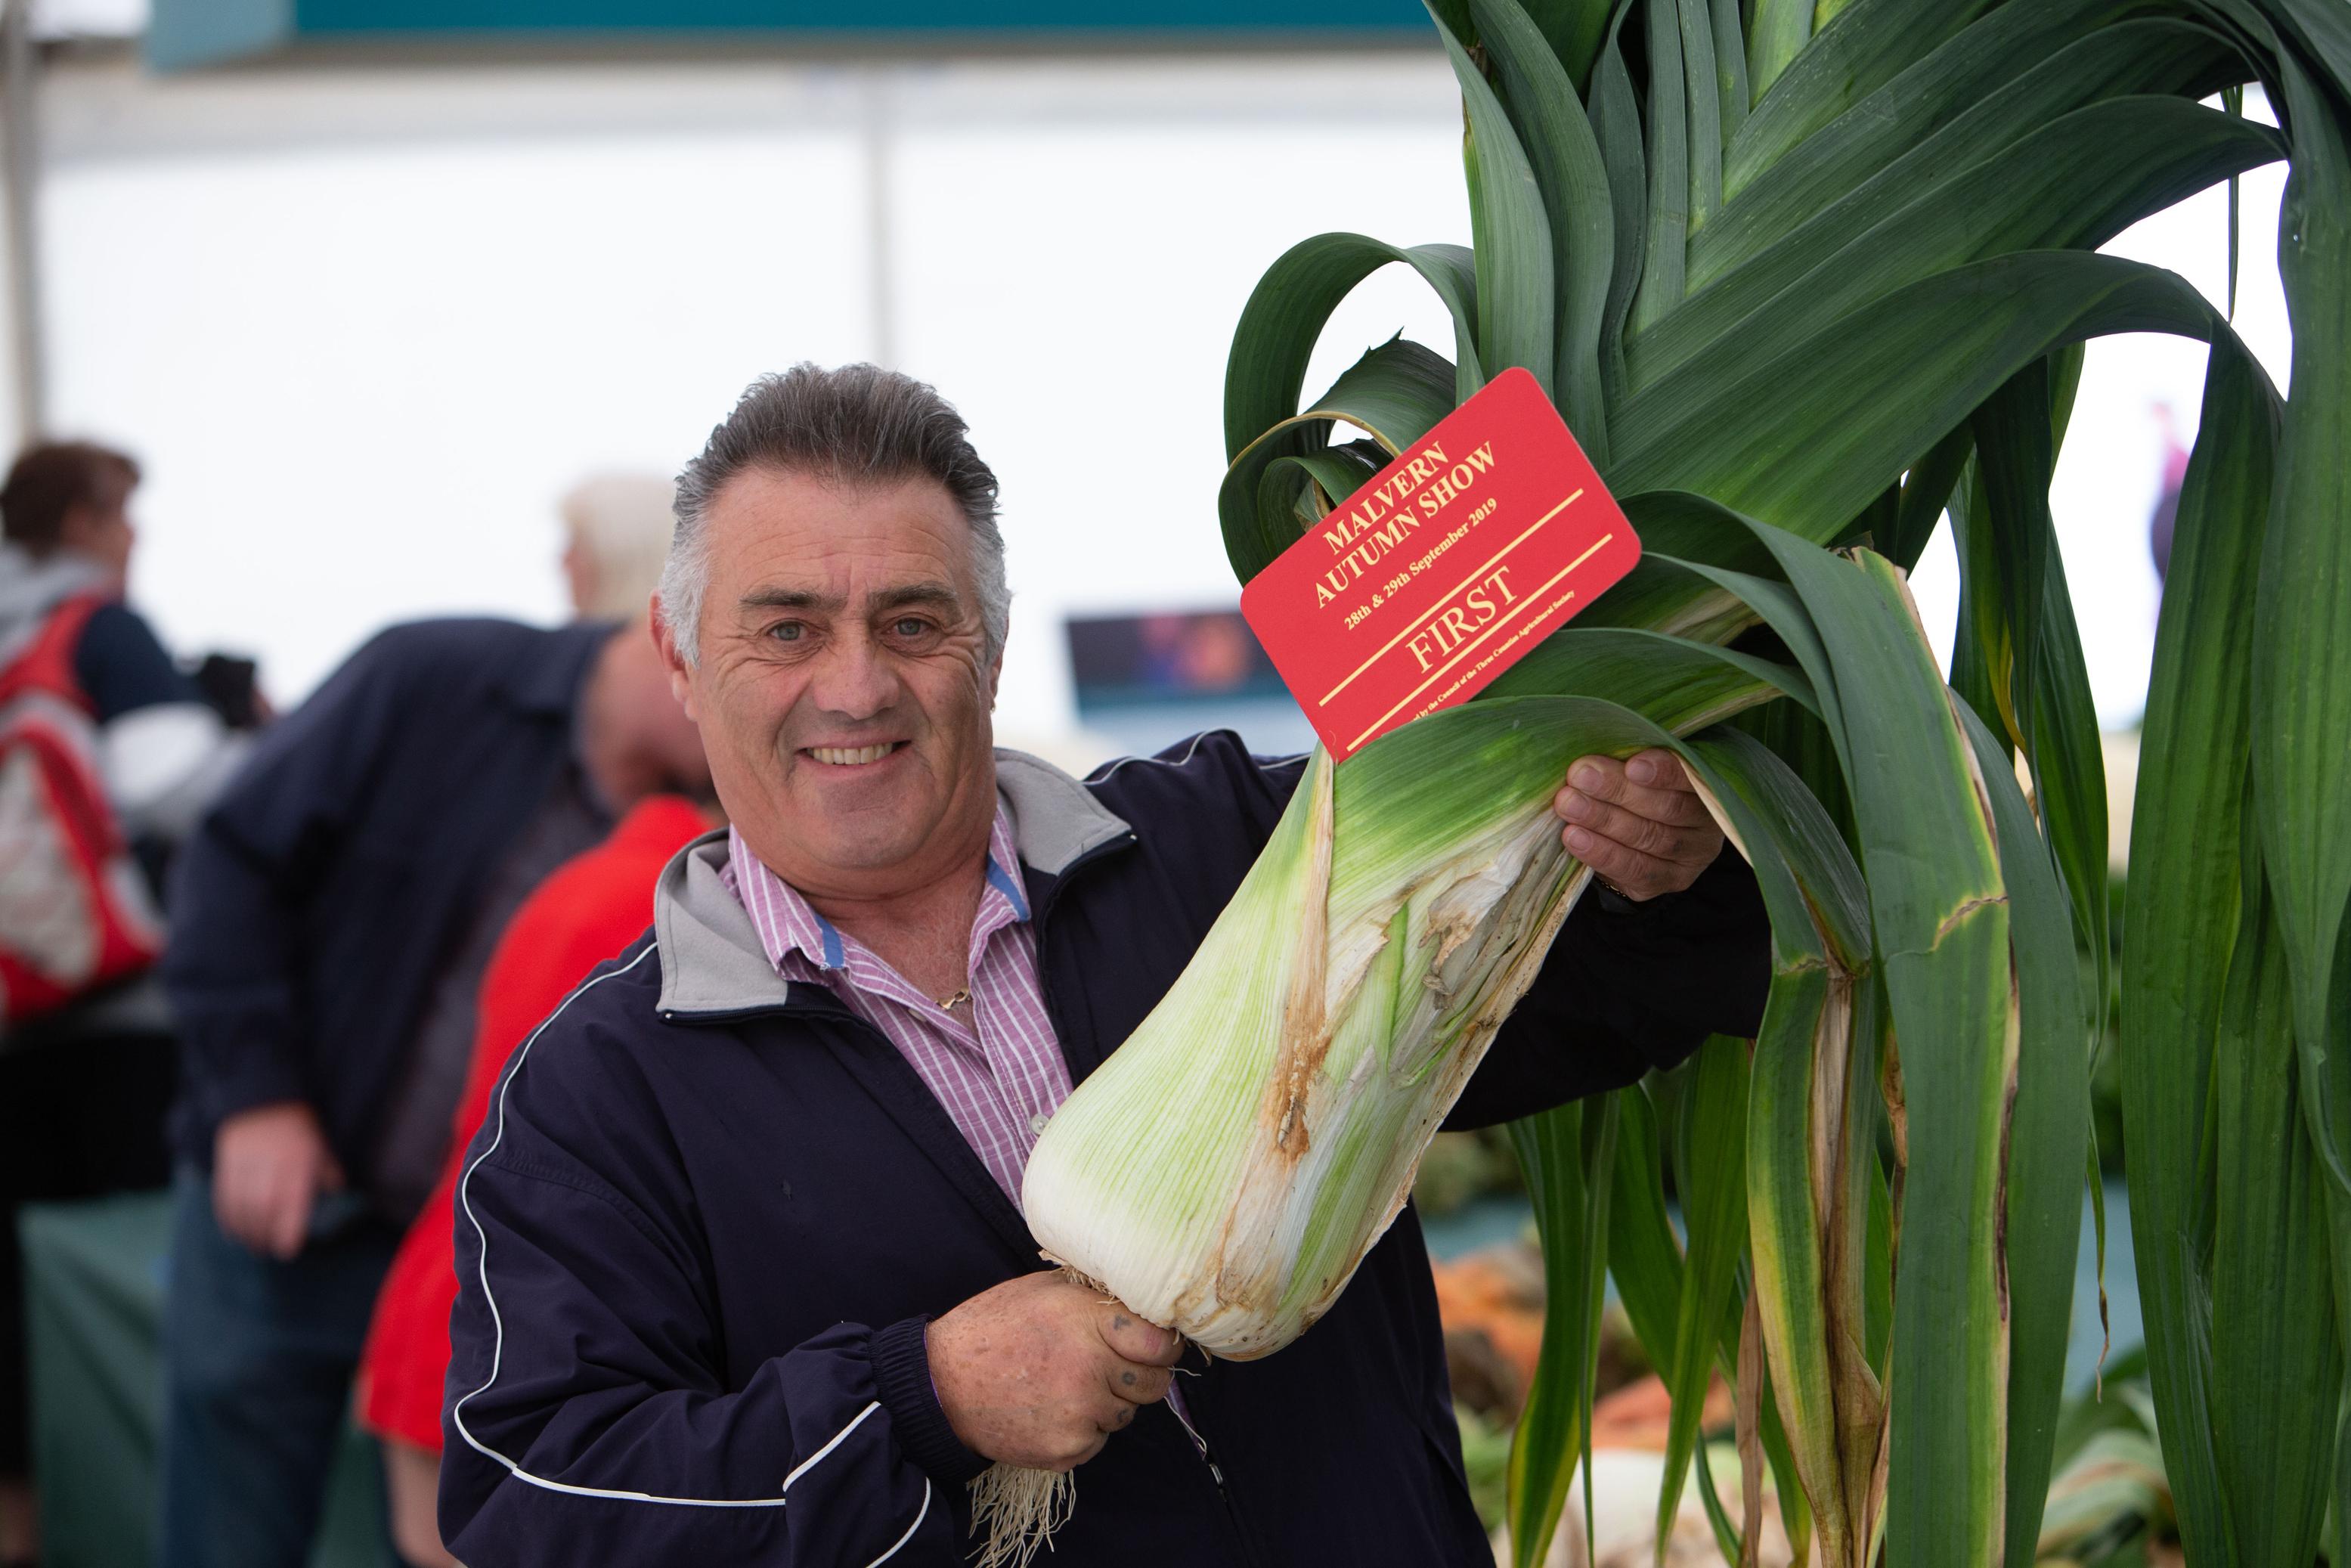 Giant veg at Malvern Autumn Show (Stuart Purfield/Three Counties Showground/PA)